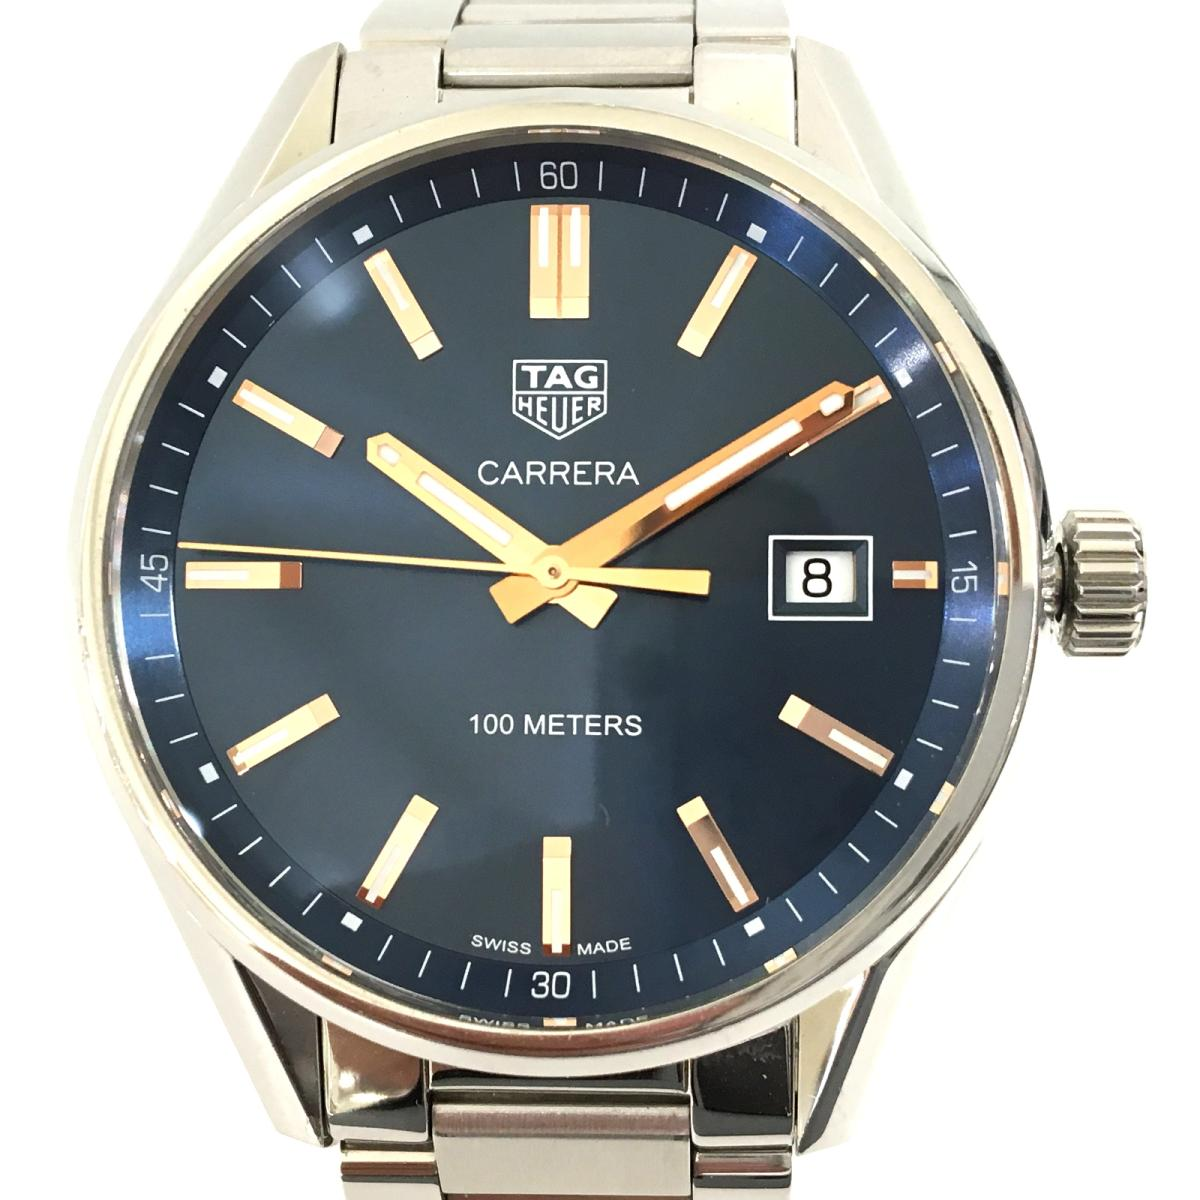 TAG HEUER カレラQZ 腕時計 ウォッチ メンズ ランクA 送料無料 プレゼント 贈答 ギフト ラッピング無料 タグホイヤー ホイヤー クオーツ 驚きの値段 全品鑑定済 中古 青系 ステンレススチール タグ SS WAR1112